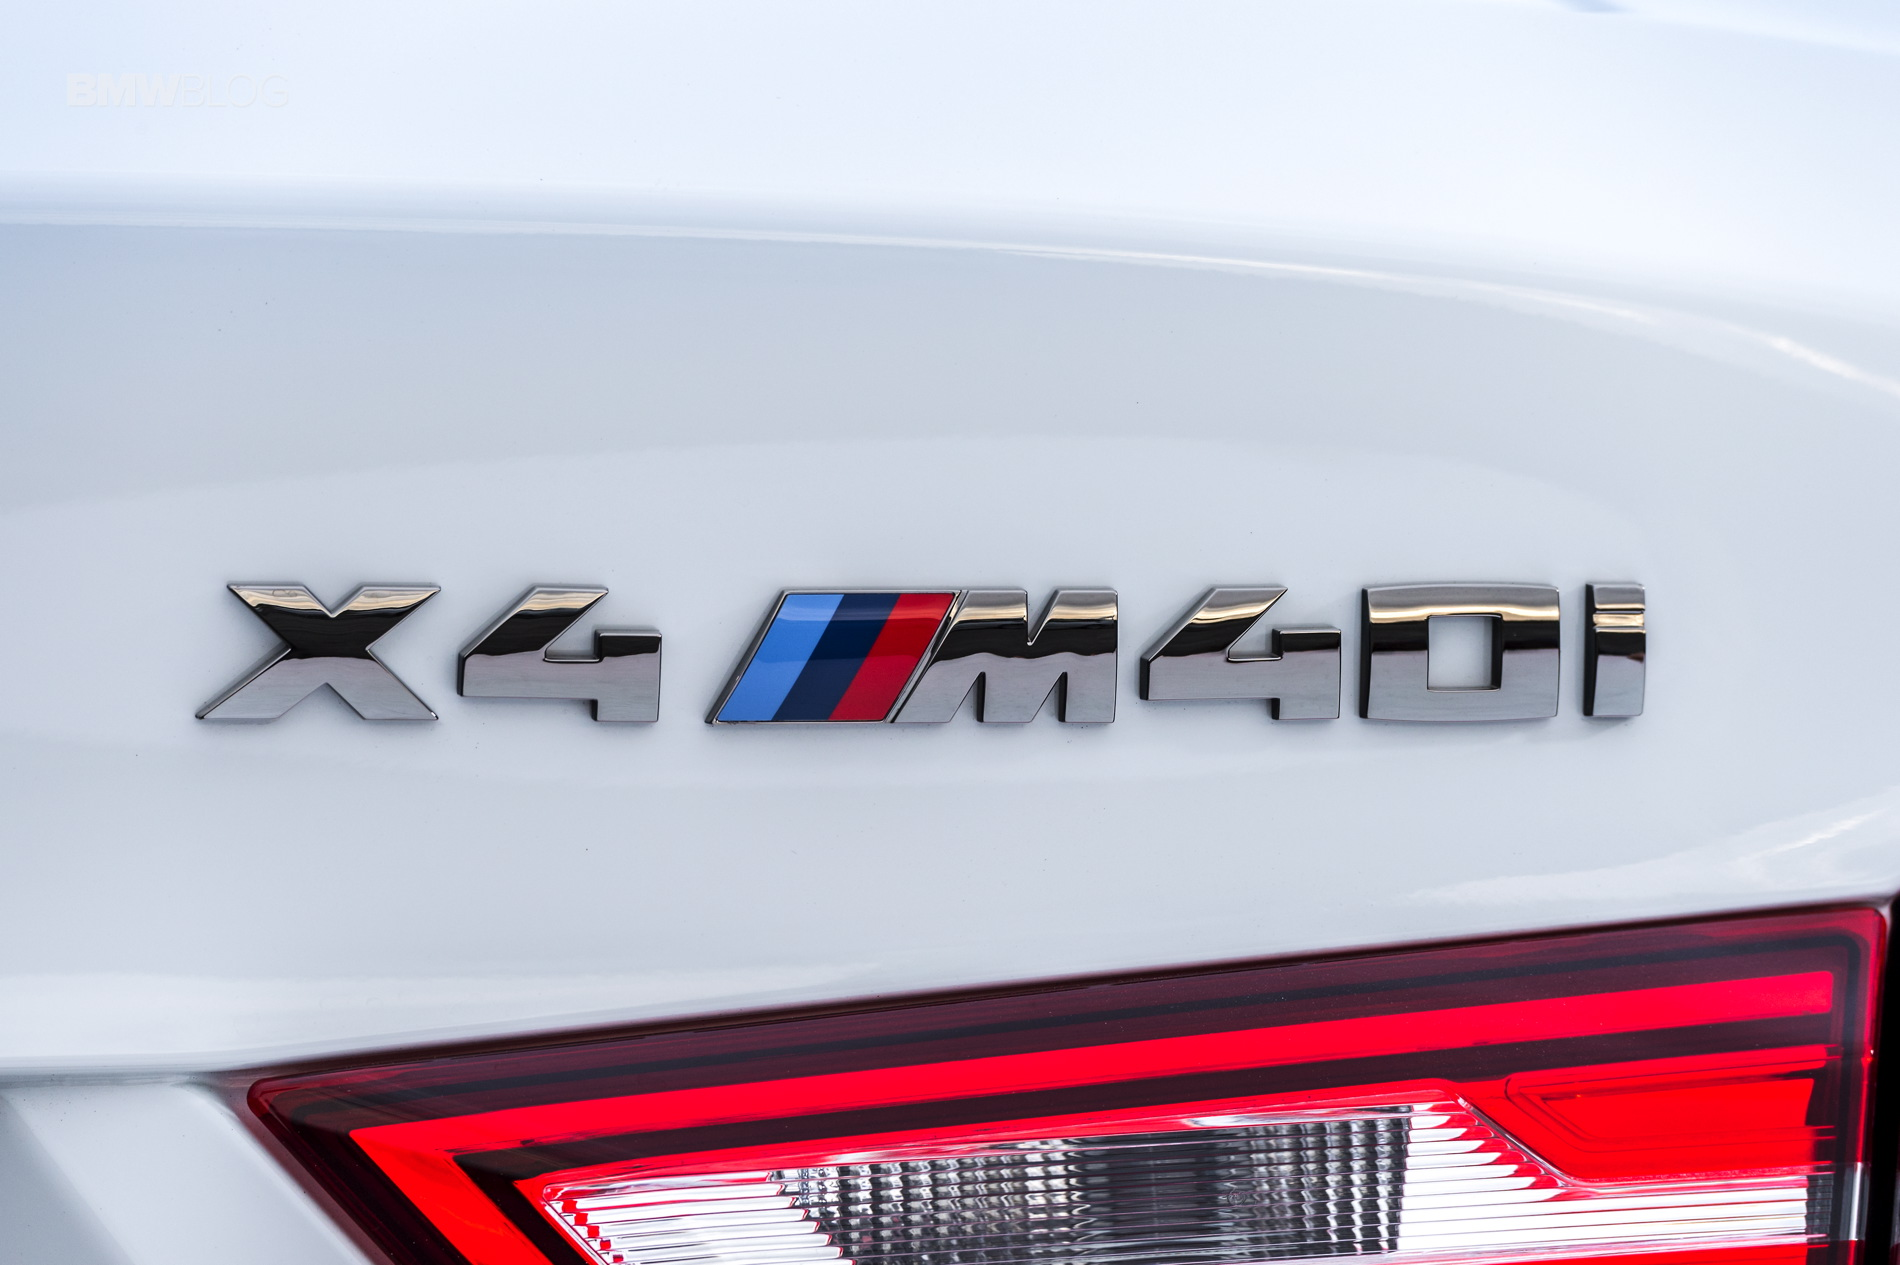 2016 BMW X4 M40i test drive review 109